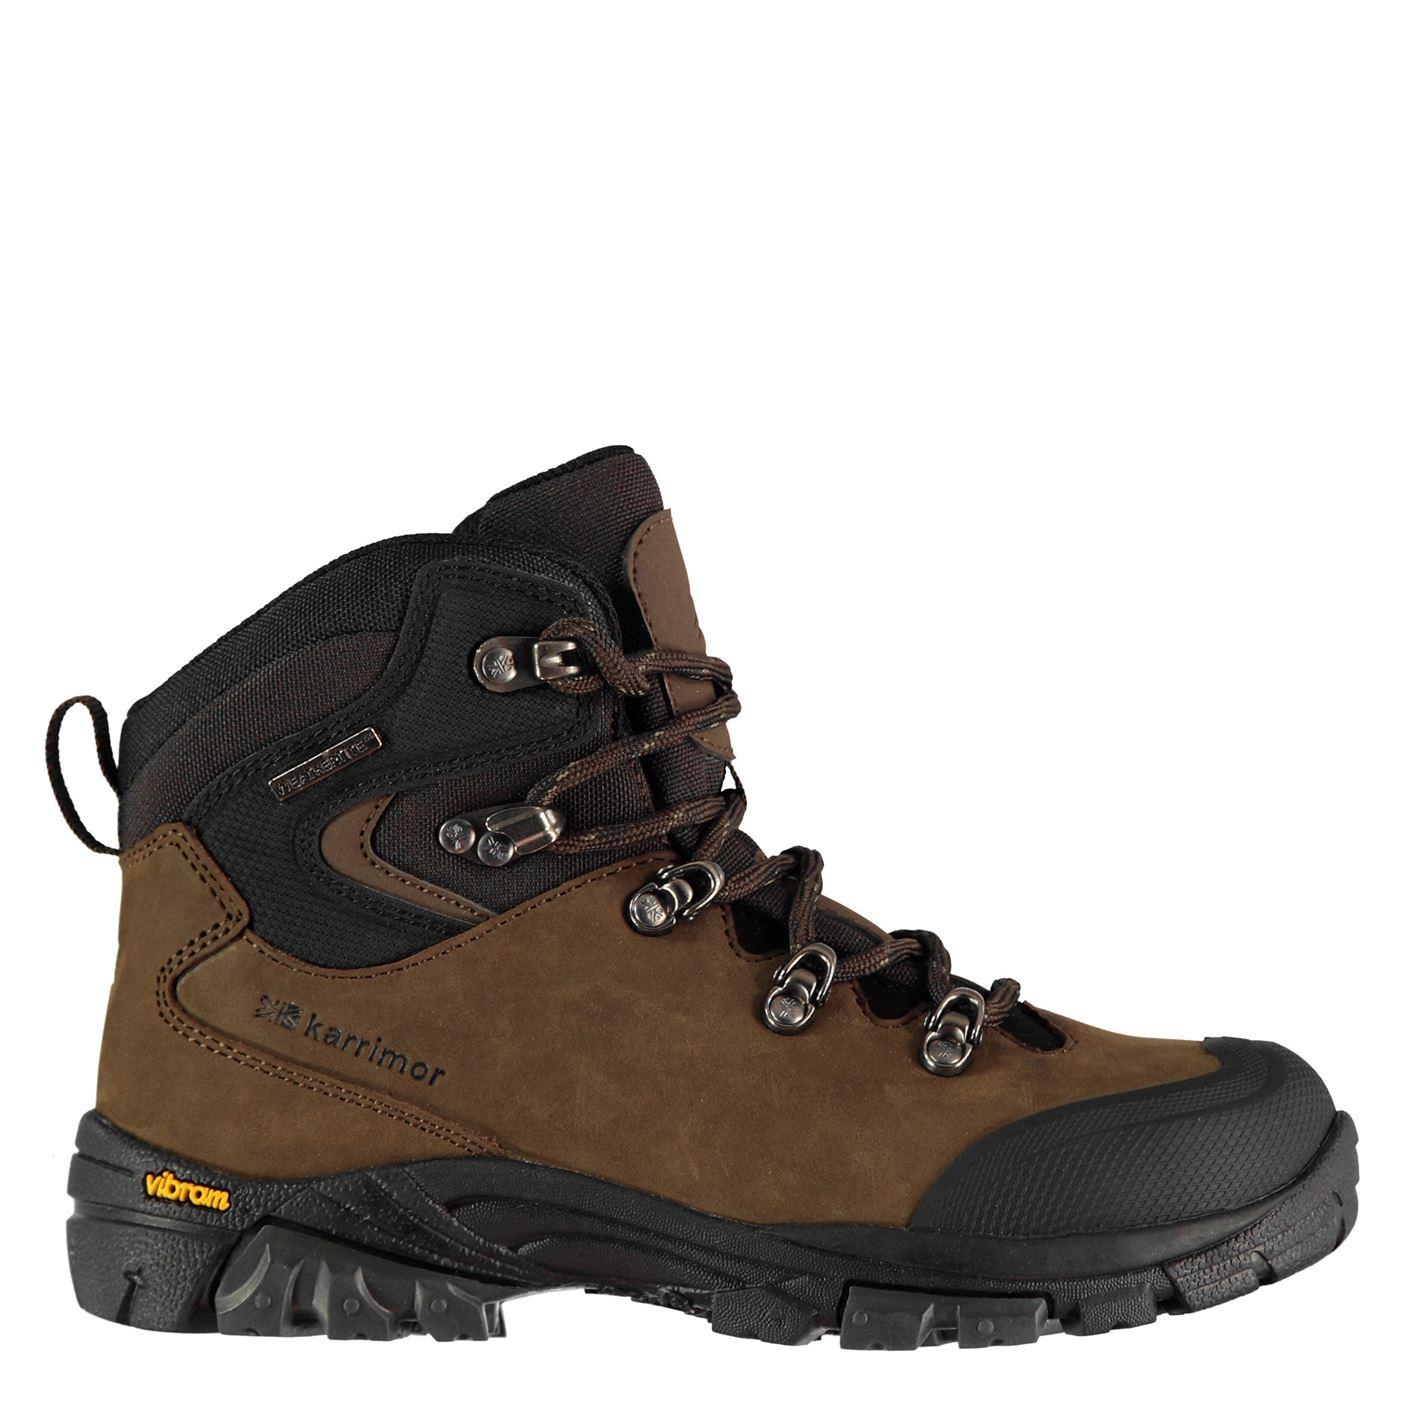 Karrimor Cheetah Junior Walking Boots